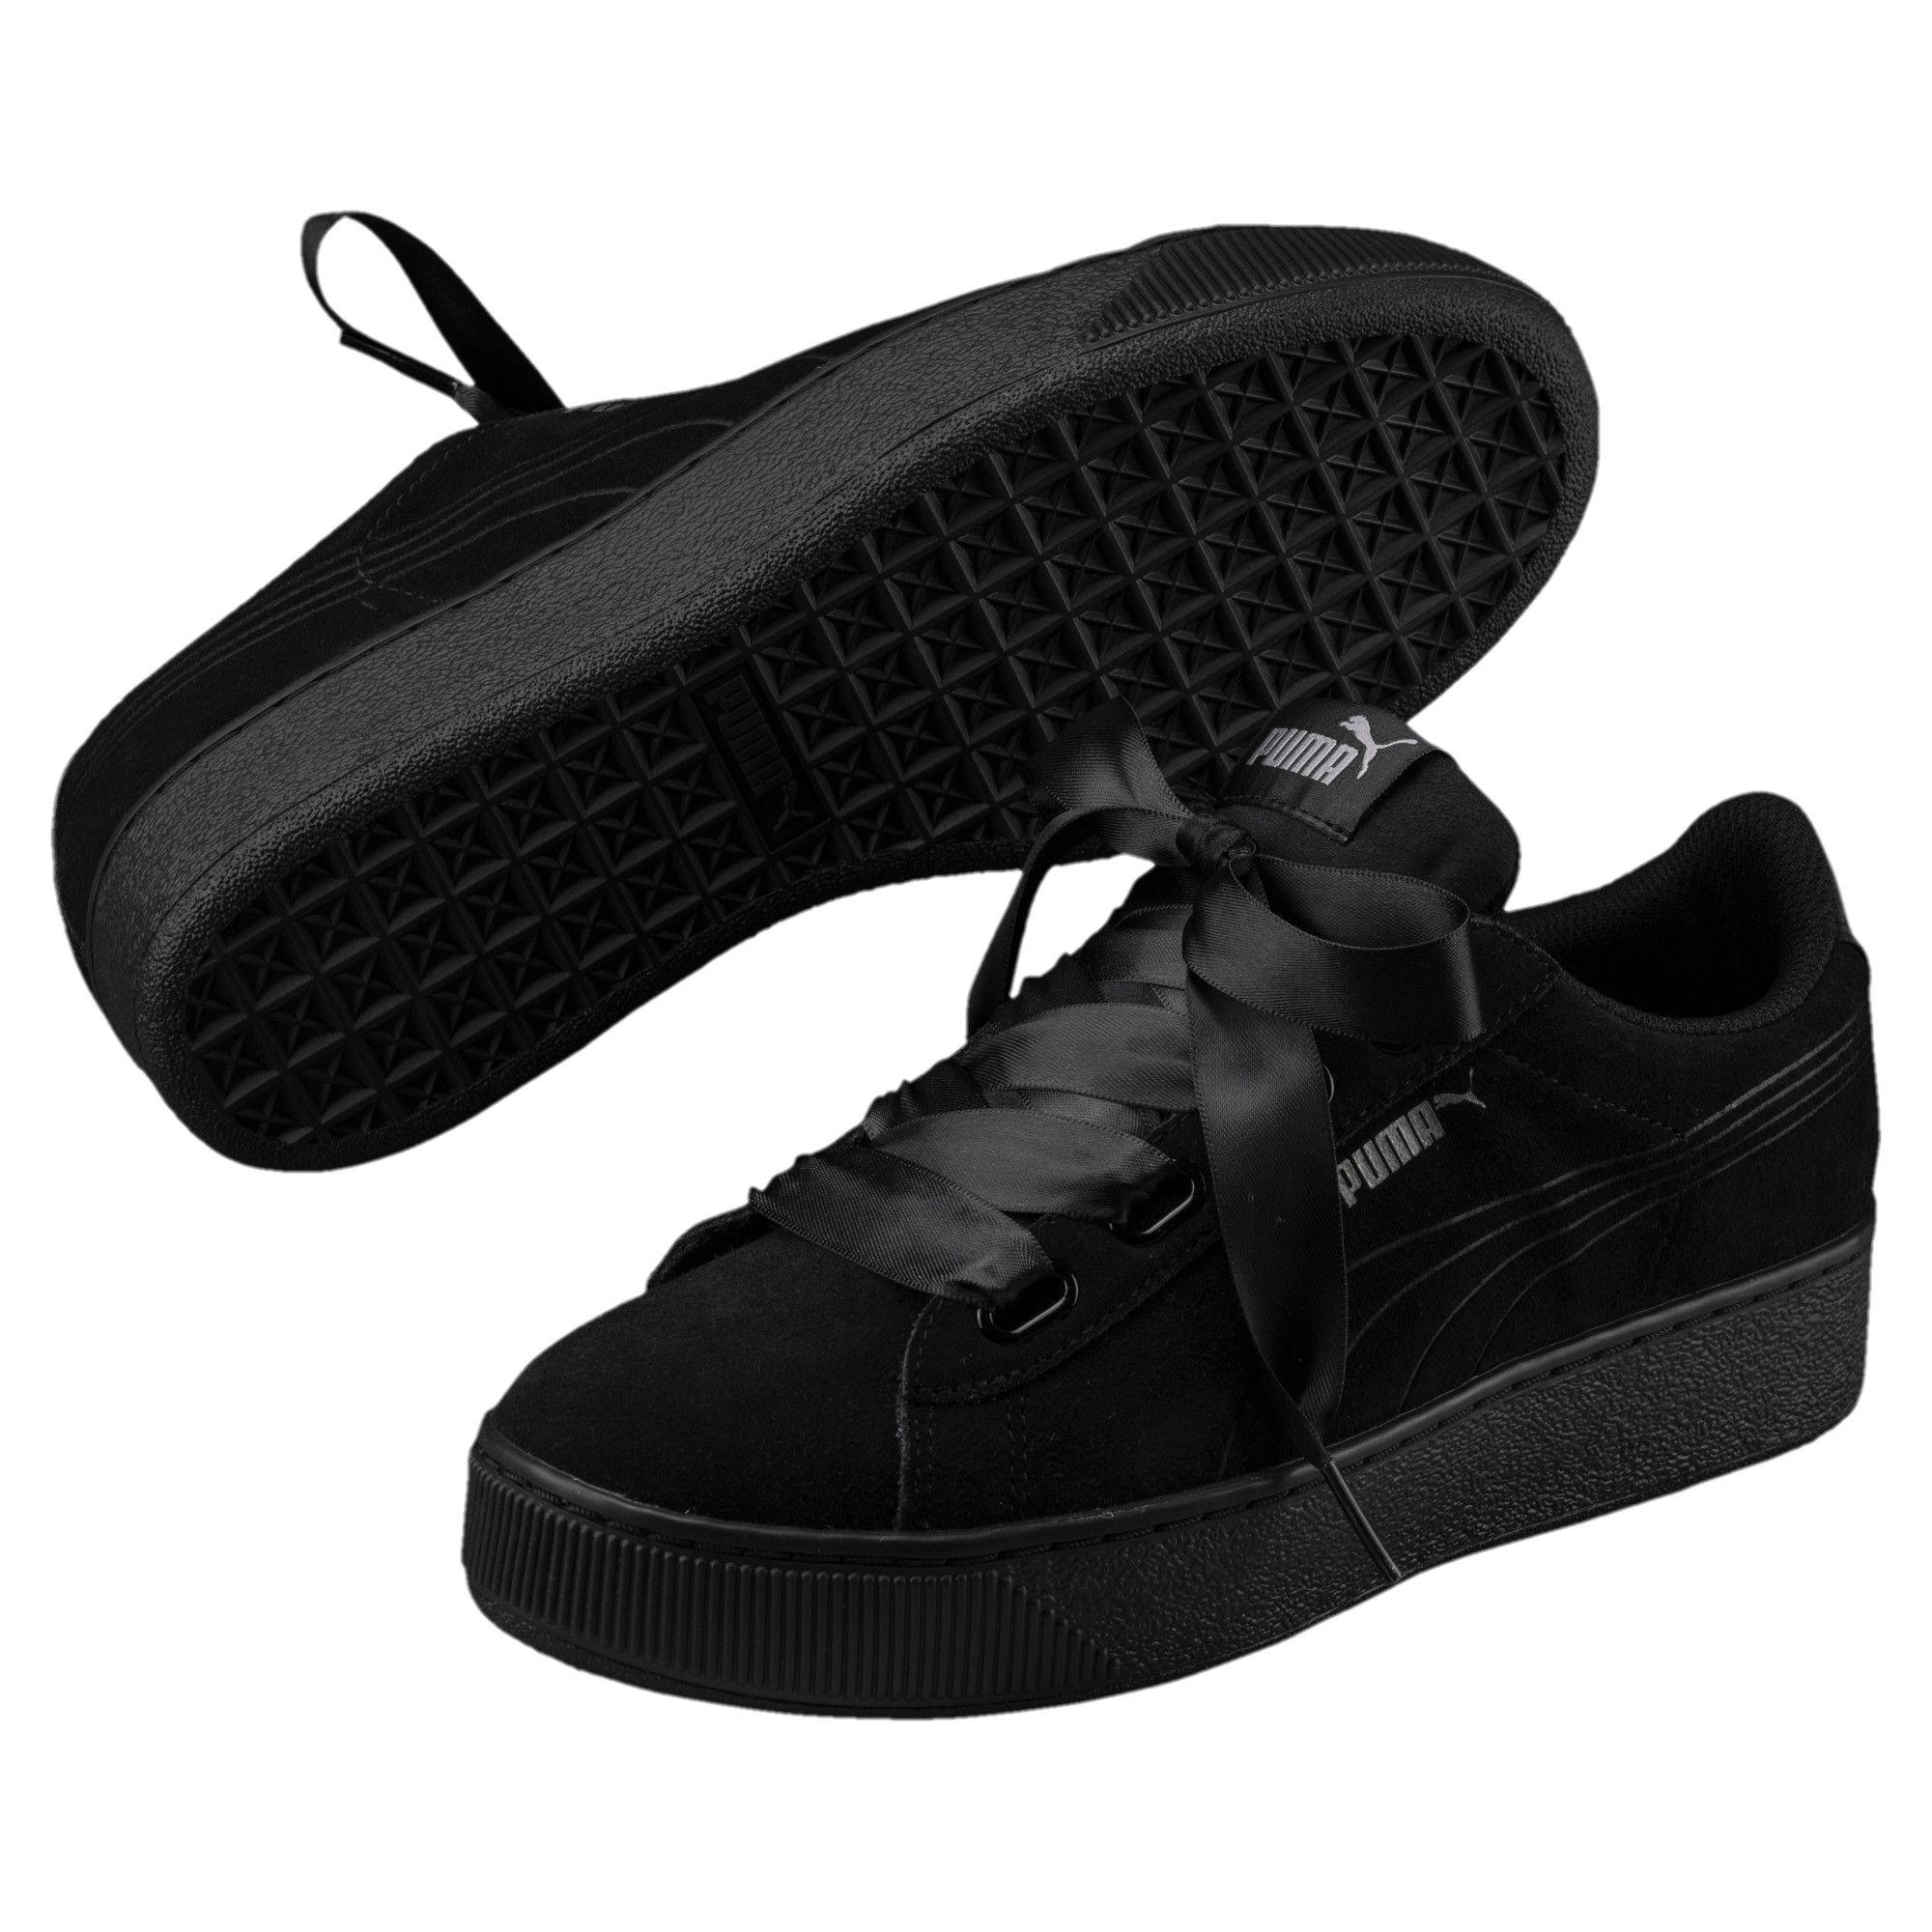 Vikky Platform Ribbon Womens Sneakers Black Puma Black Sneakers Women Womens Sneakers Puma Vikky Platform